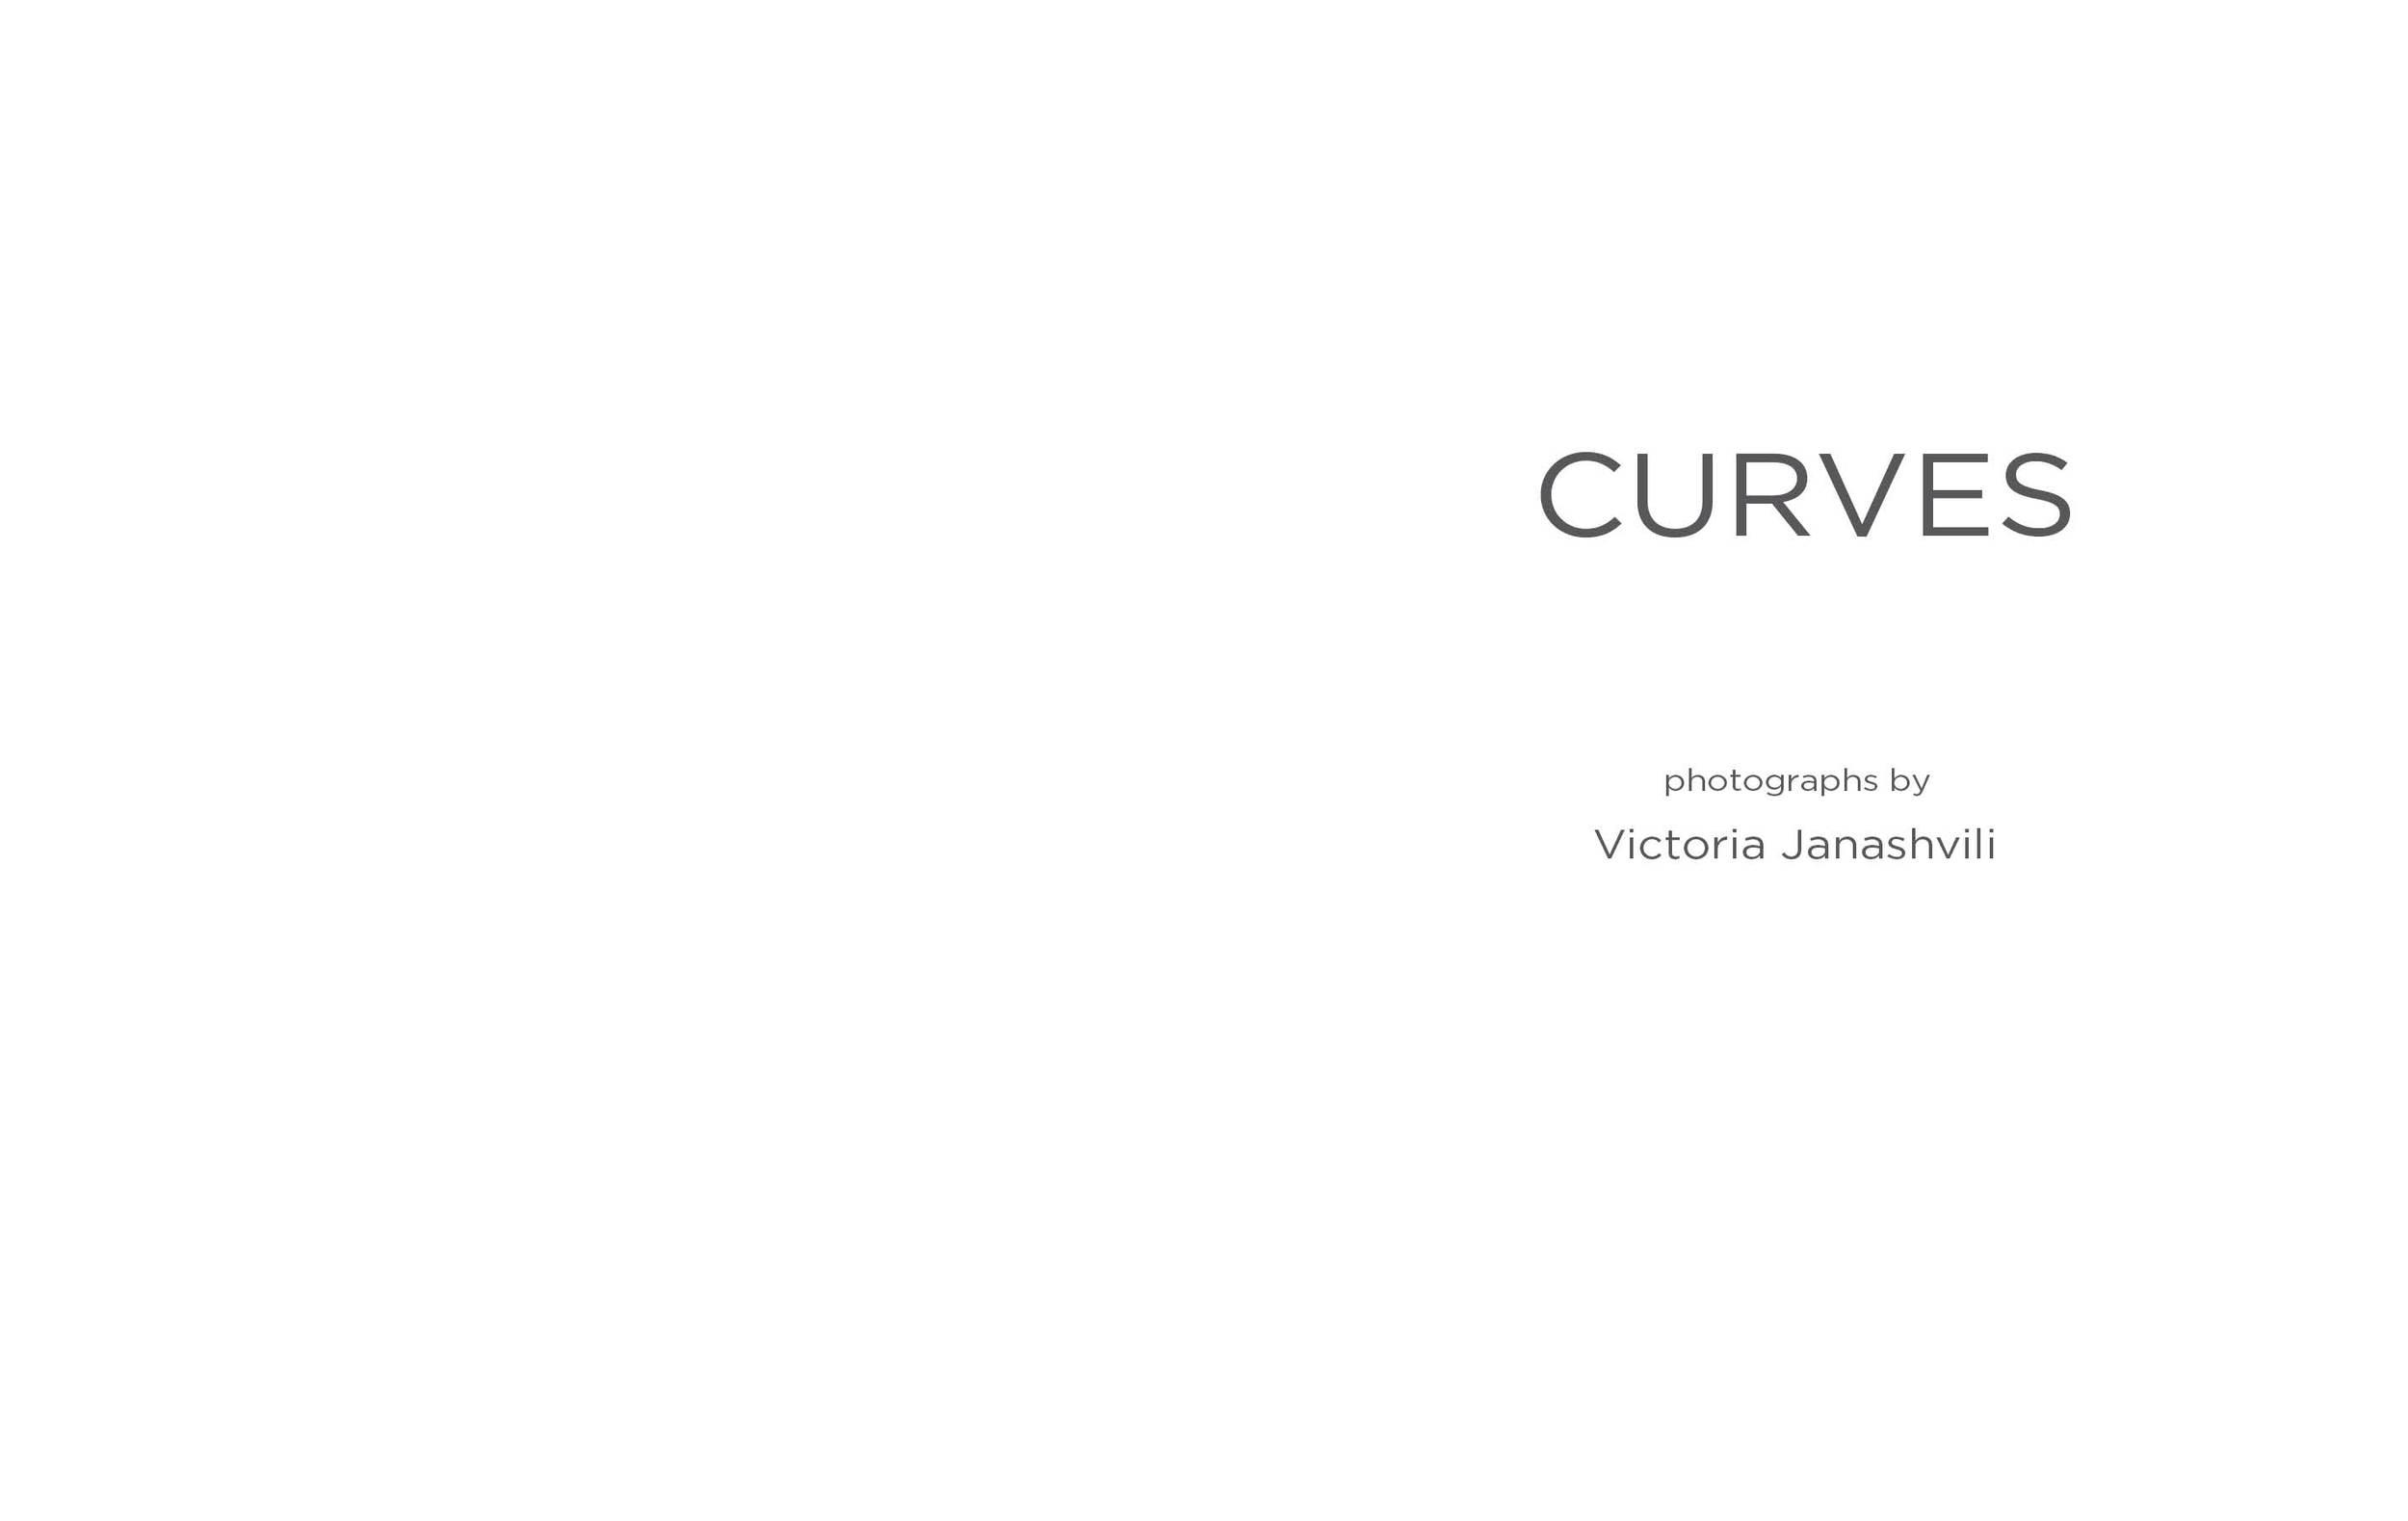 curves 2.jpg